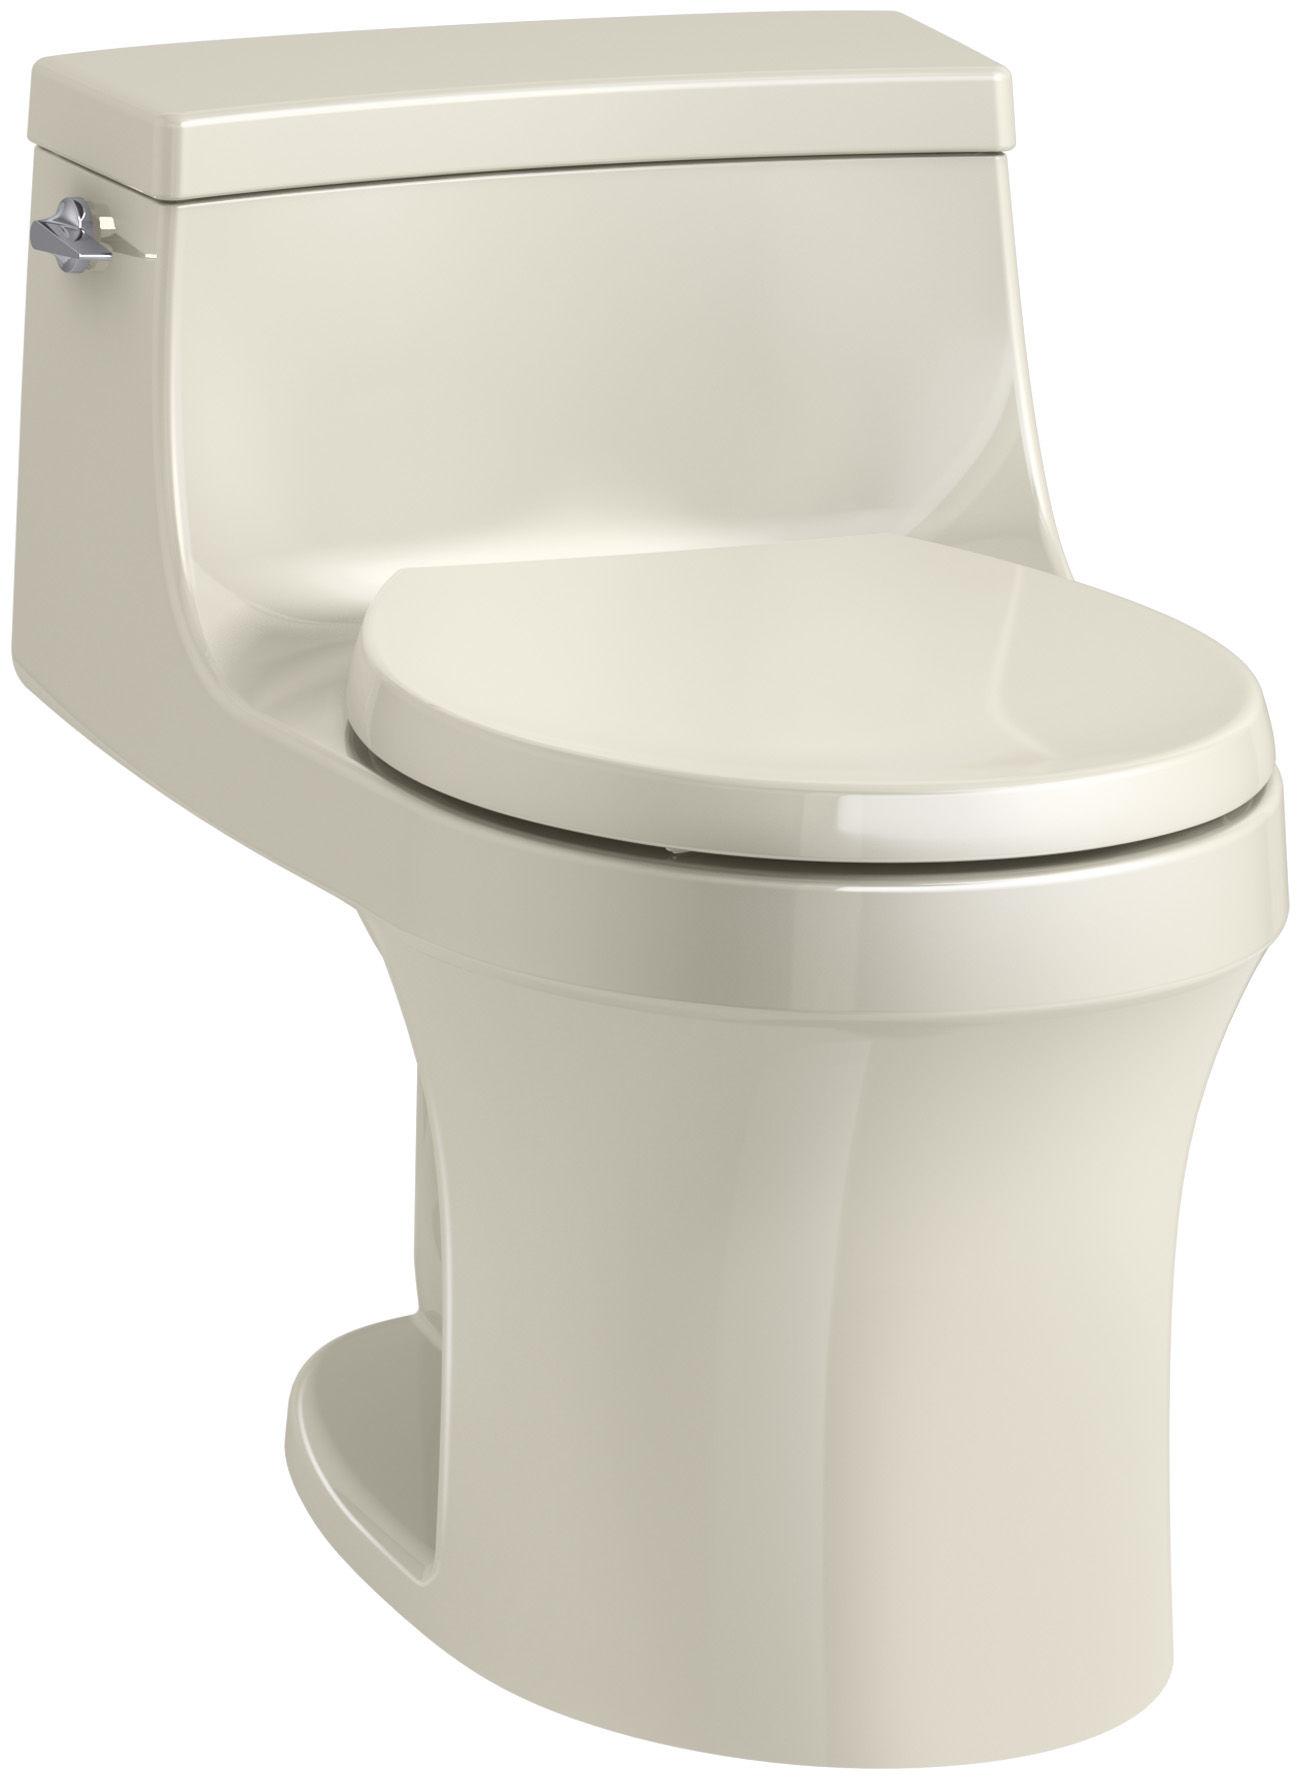 Stupendous Kohler K 4007 0 White San Souci 1 28 Gpf One Piece Round Pabps2019 Chair Design Images Pabps2019Com